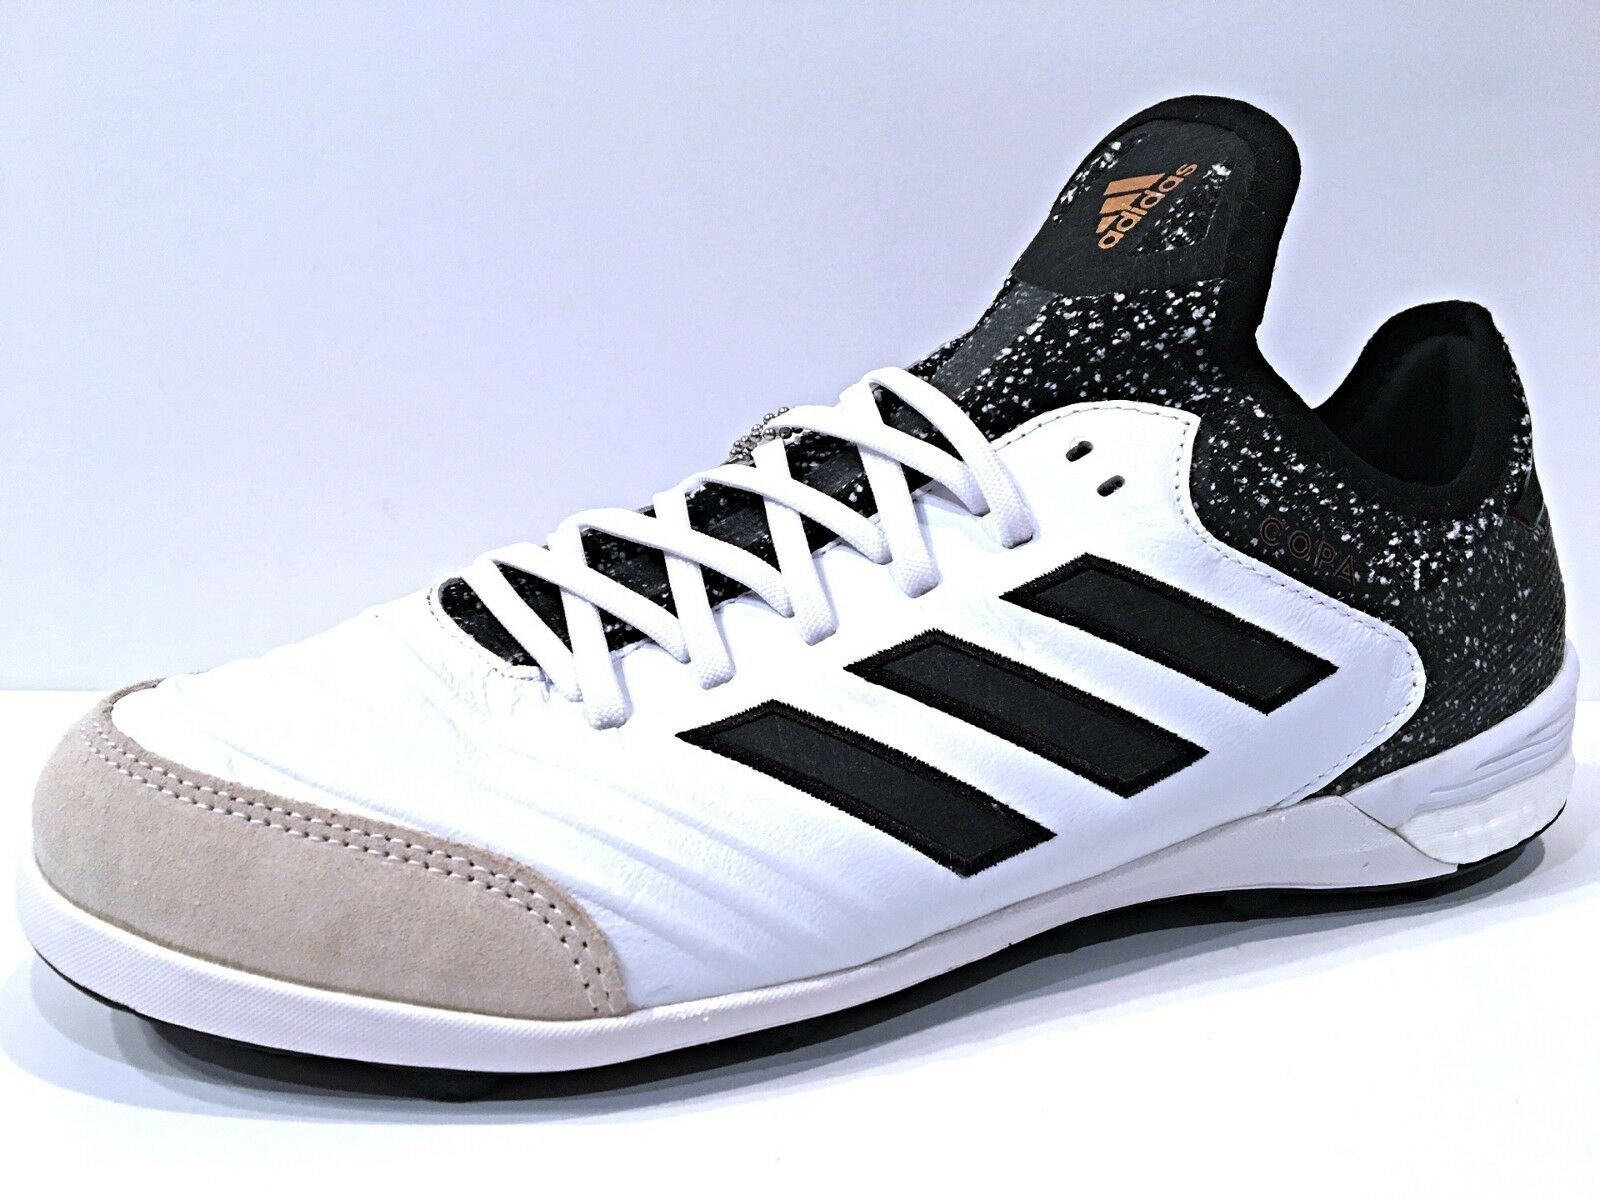 Adidas copa tango 18,1 männer rasen fußball - bequem stiefel fußball - schuhe bequem - 2f9299